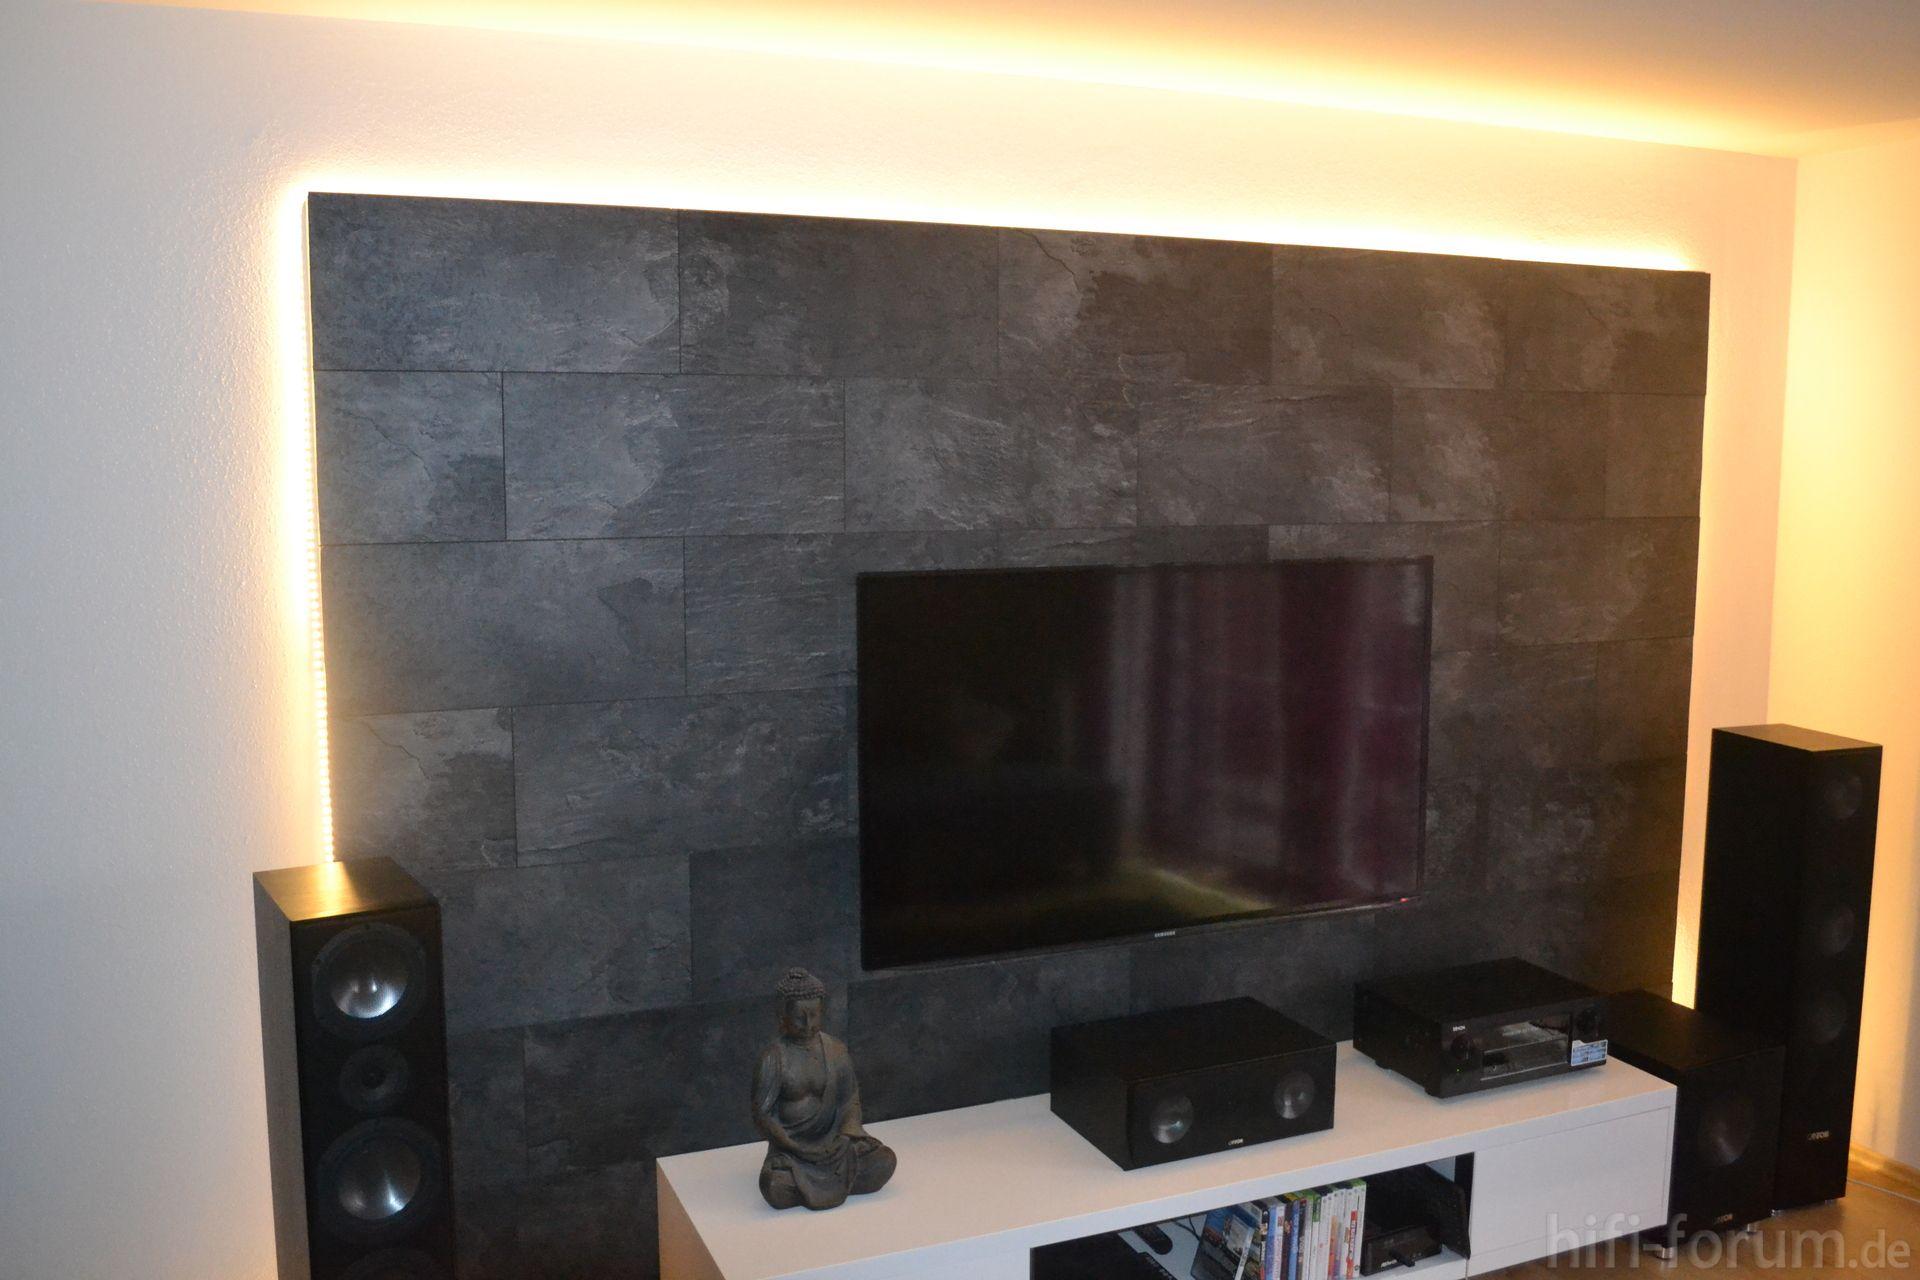 tv wand zwischenstand | haus | pinterest | wand, tvs and tv walls